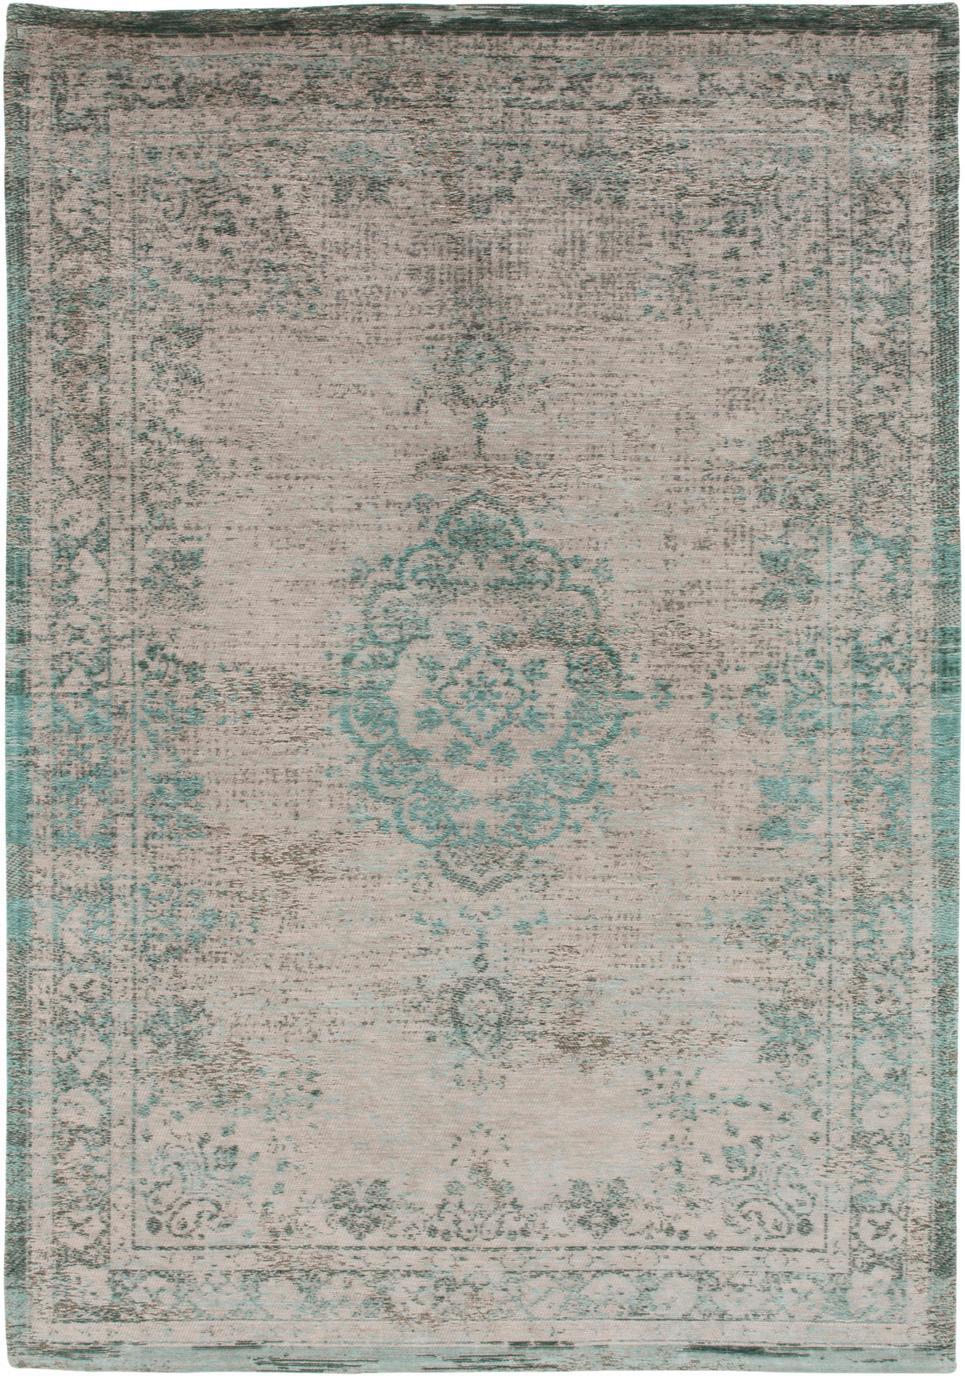 Alfombra de chenilla Medaillon, estilo vintage, Parte superior: chenilla (algodón), Reverso: tejido de chenilla, recub, Verde, rosa, An 170 x L 240 cm (Tamaño M)